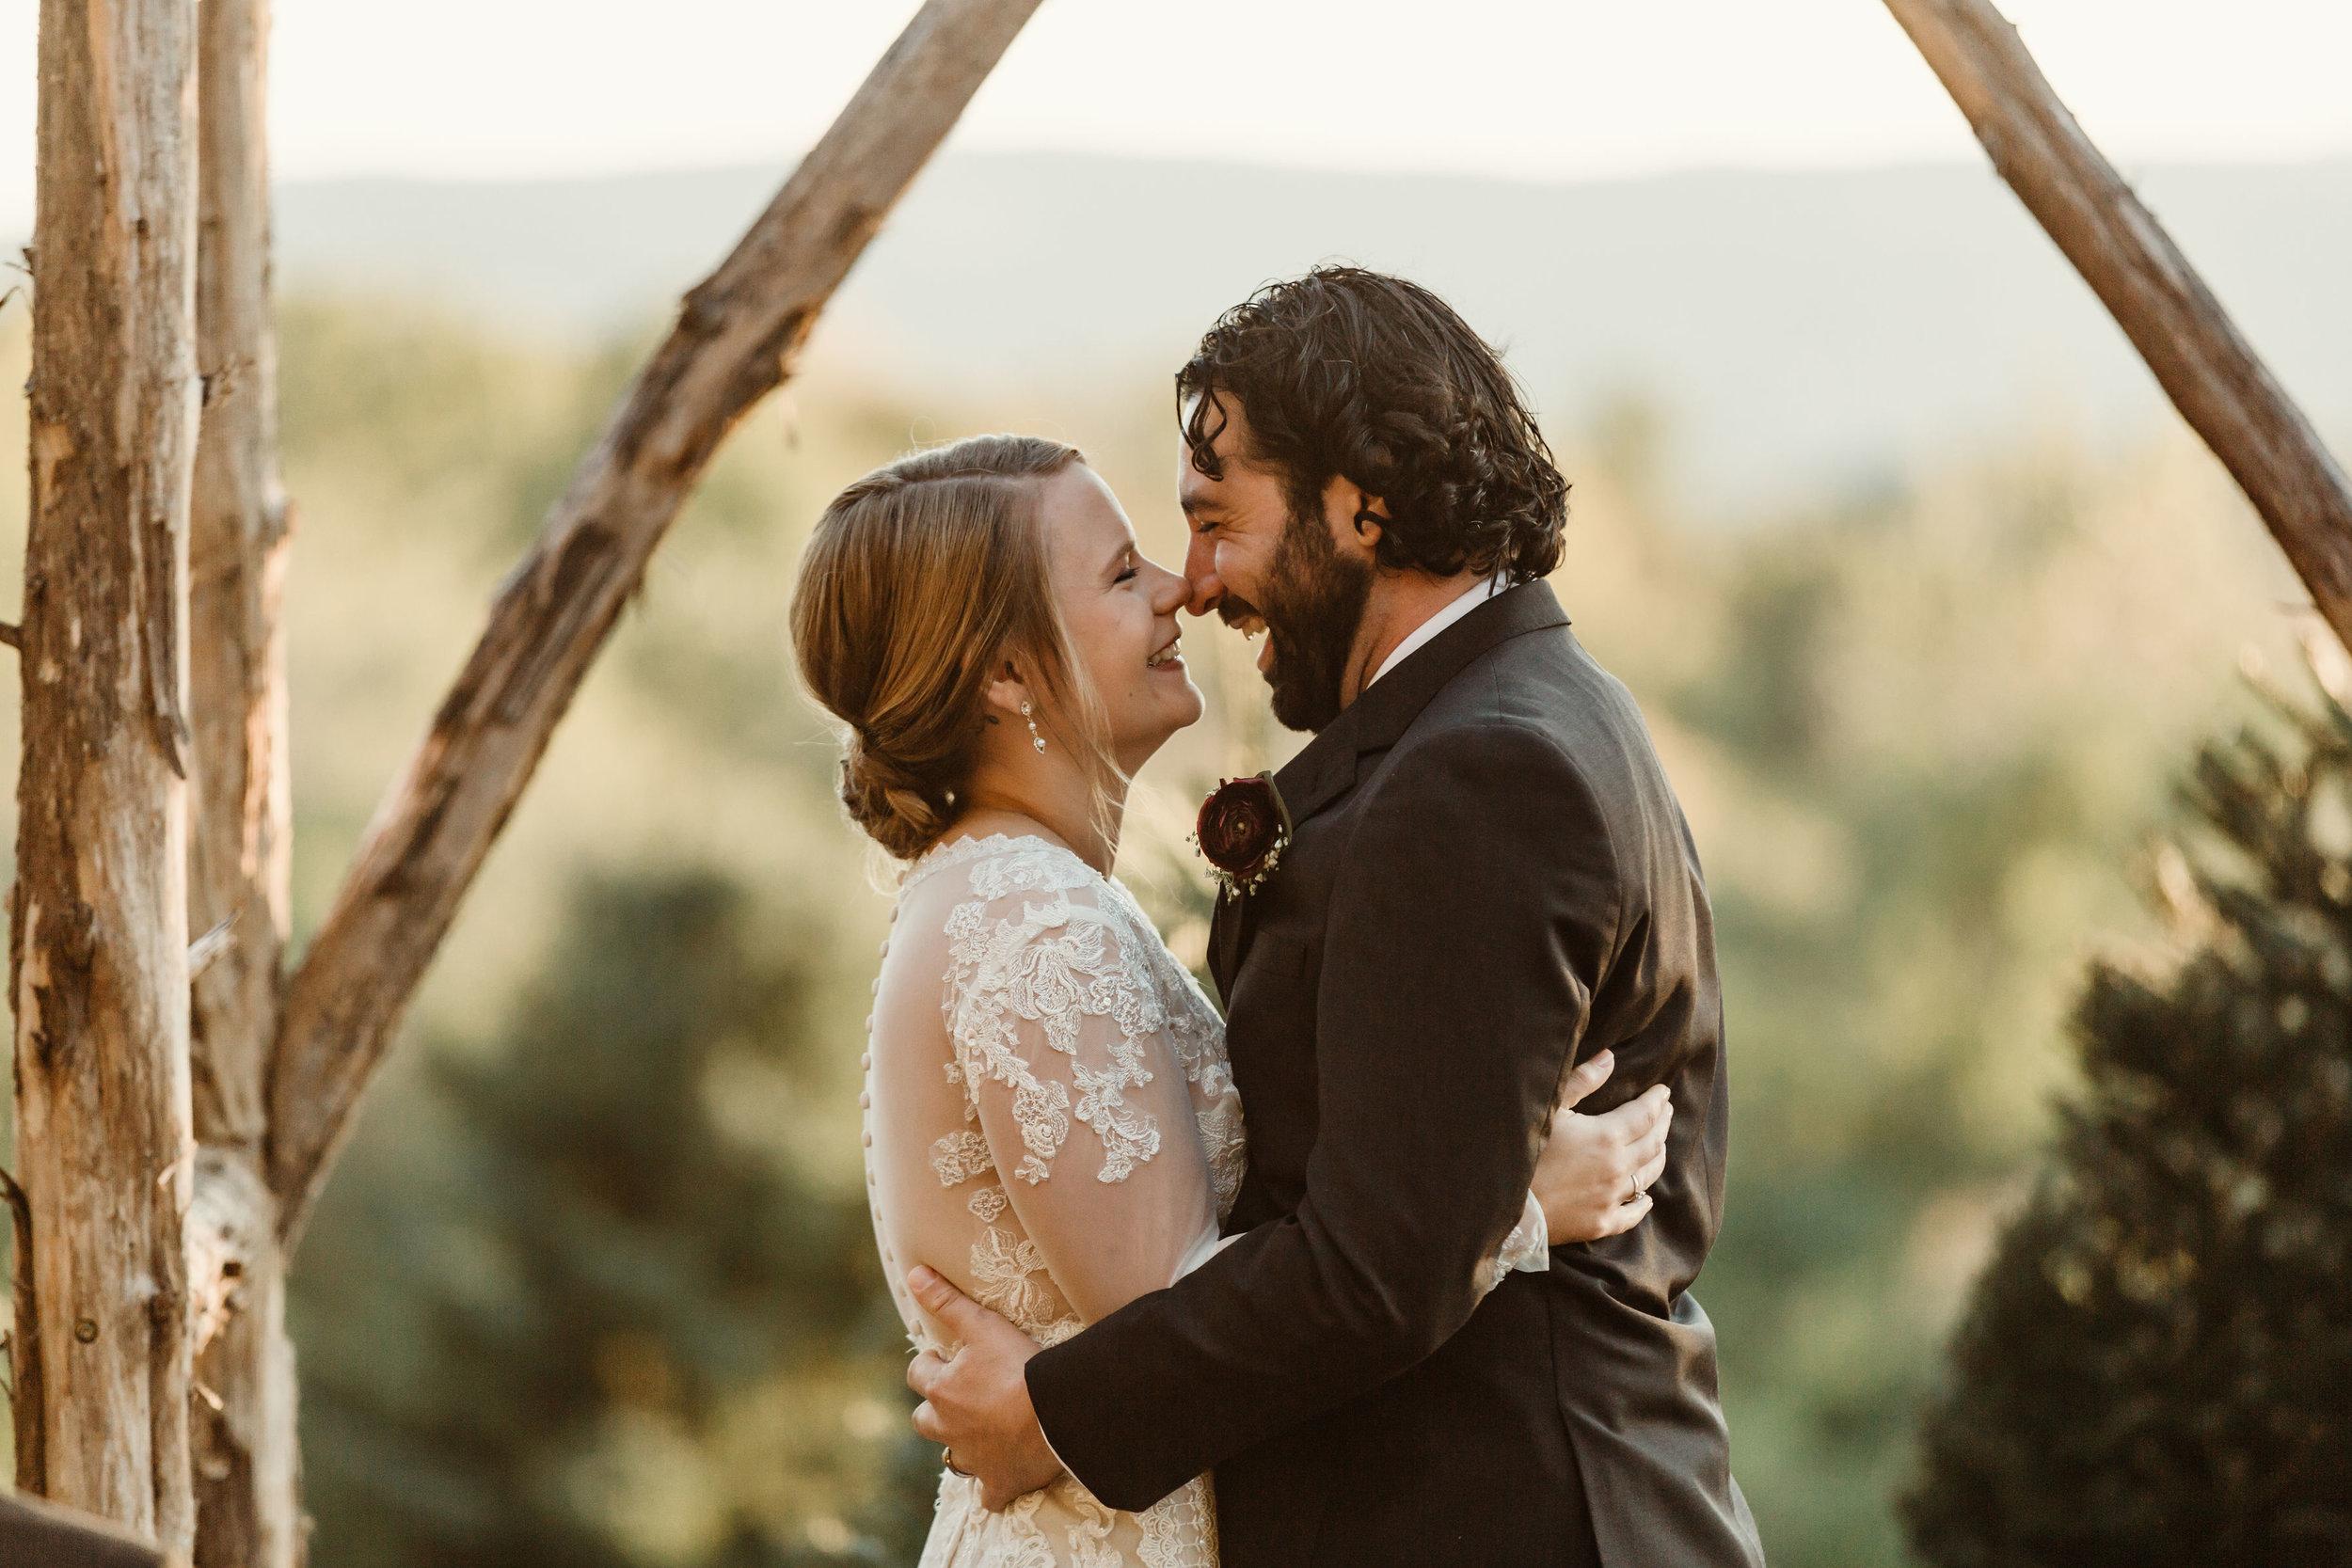 young-love-media-rustic-fall-autumn-wedding-emmerich-tree-farm-hudson-valley-warwick-new-york-ceremony-227.jpg